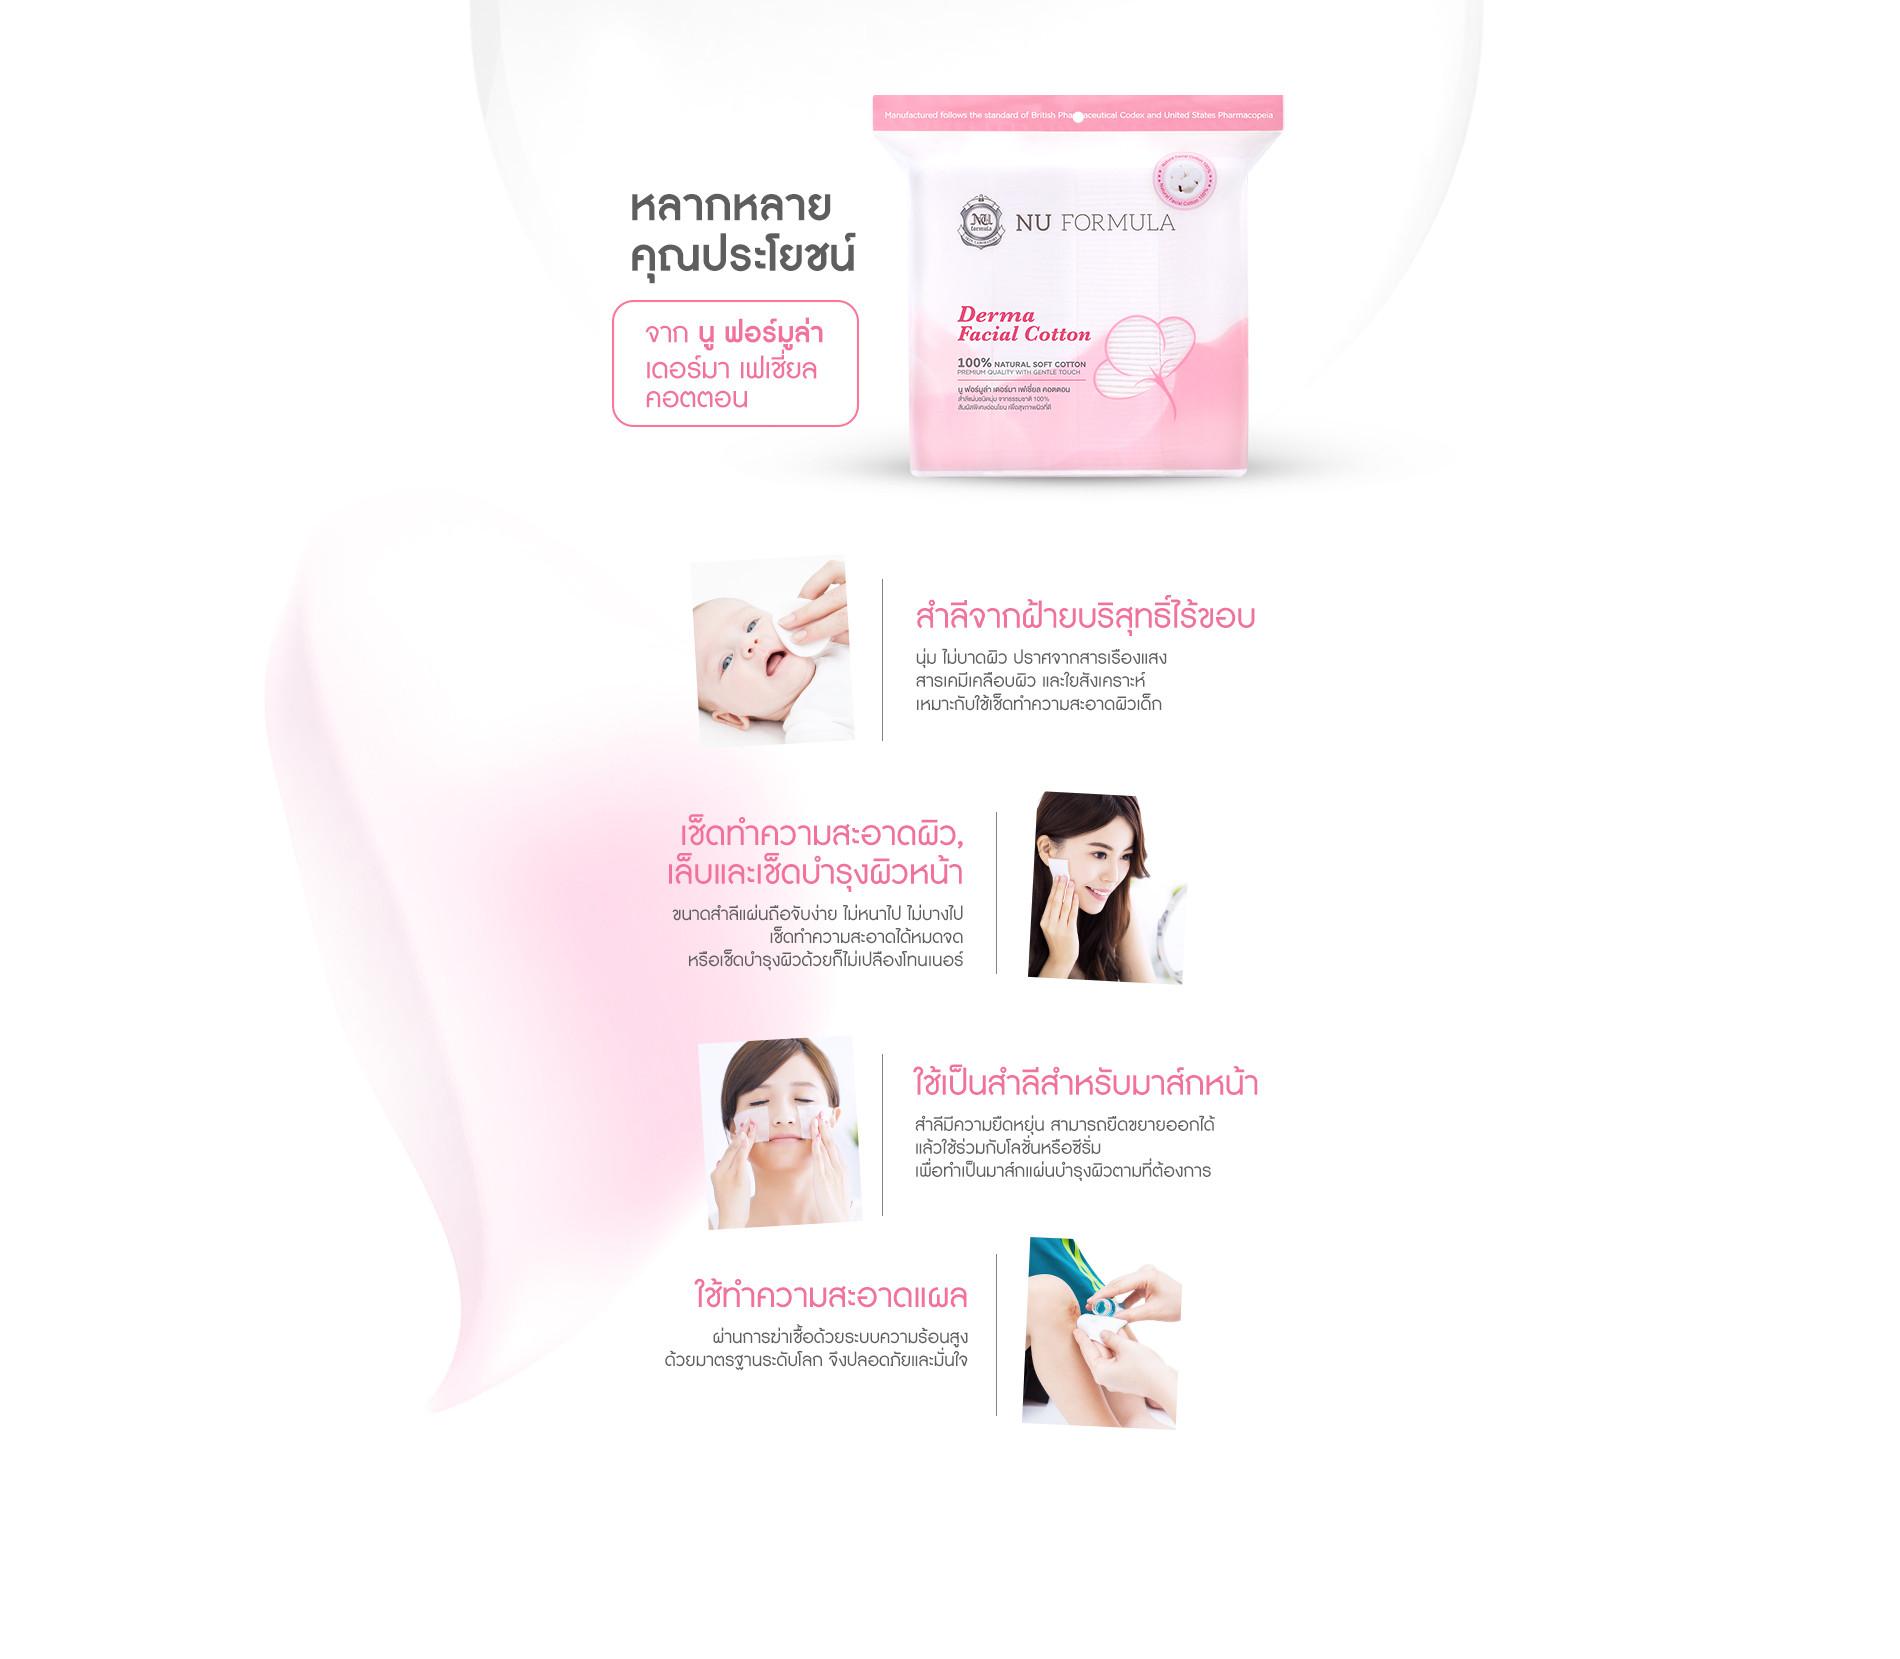 NUF-Derma-Facial-CottonTH_05.jpg